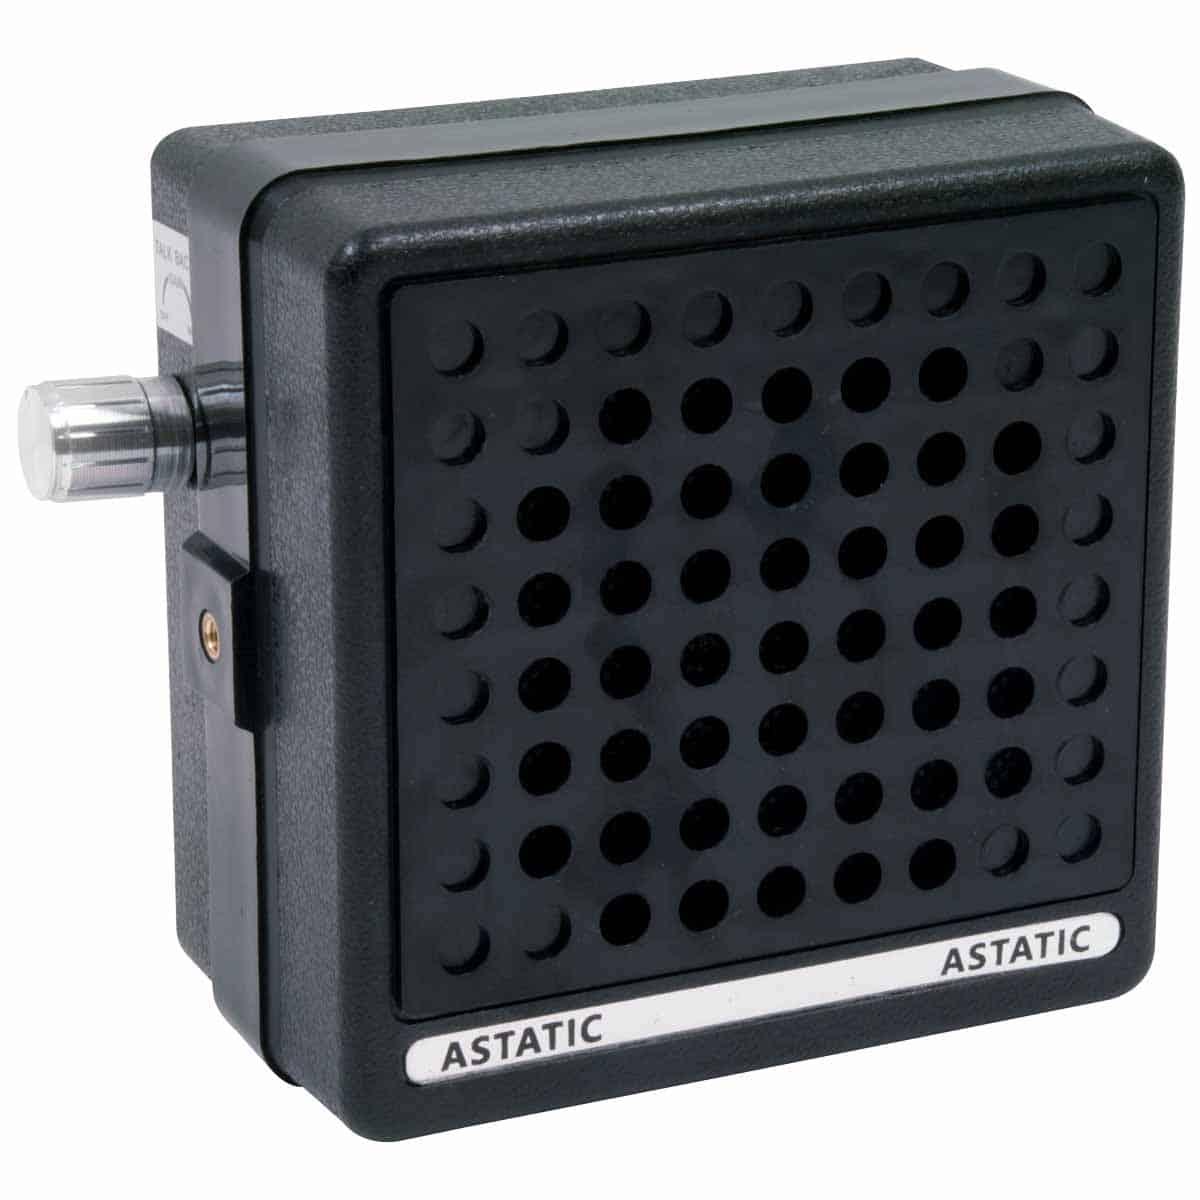 VS7 - Astatic 10 Watt ANL Noise Canceling Talkback Speaker